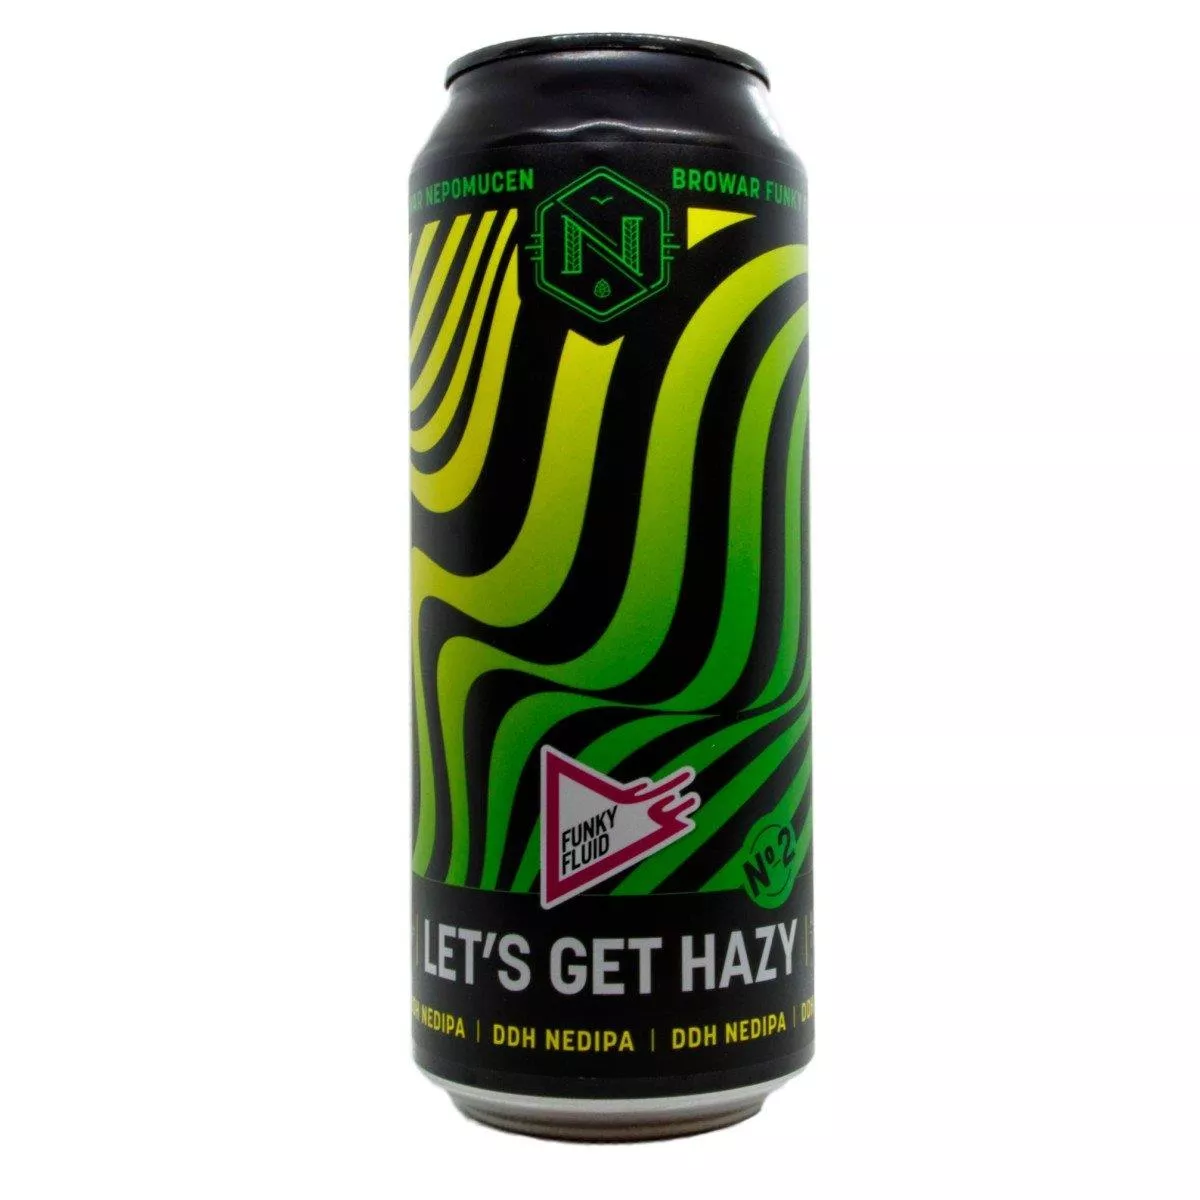 Funky Fluid Let's Get Hazy No. 2 CANS 50cl